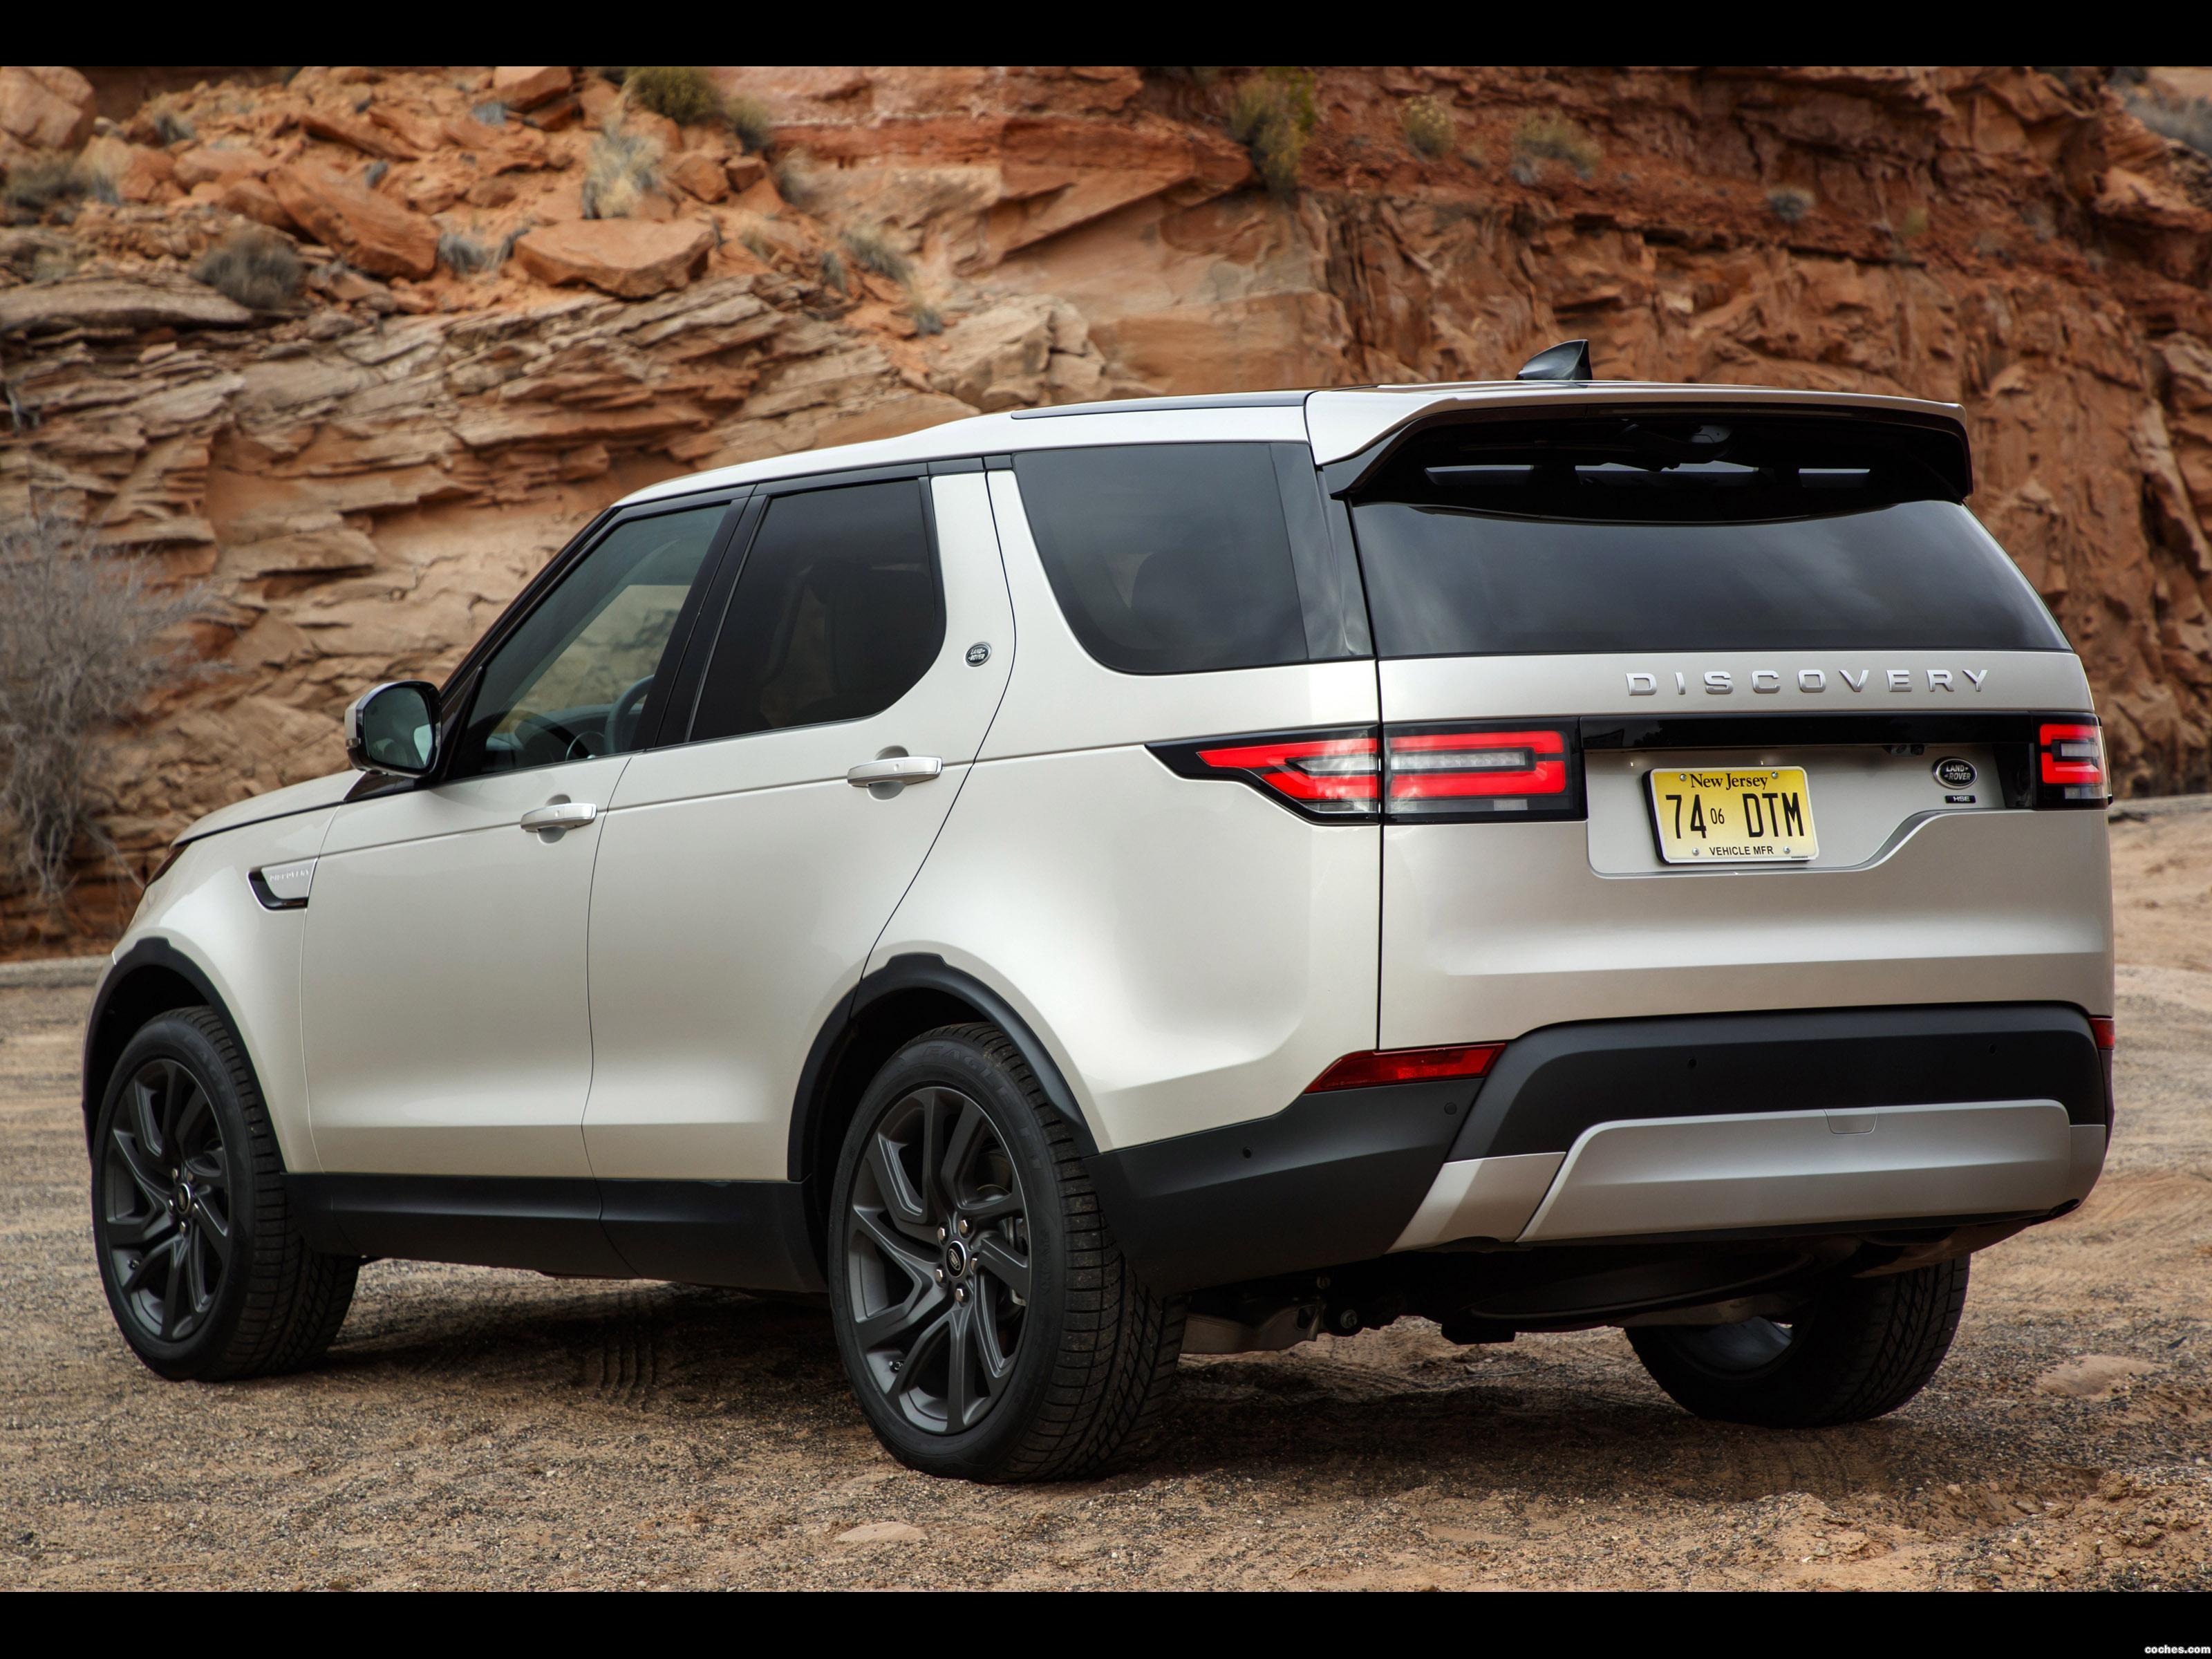 Foto 3 de Land Rover Discovery HSE 2017